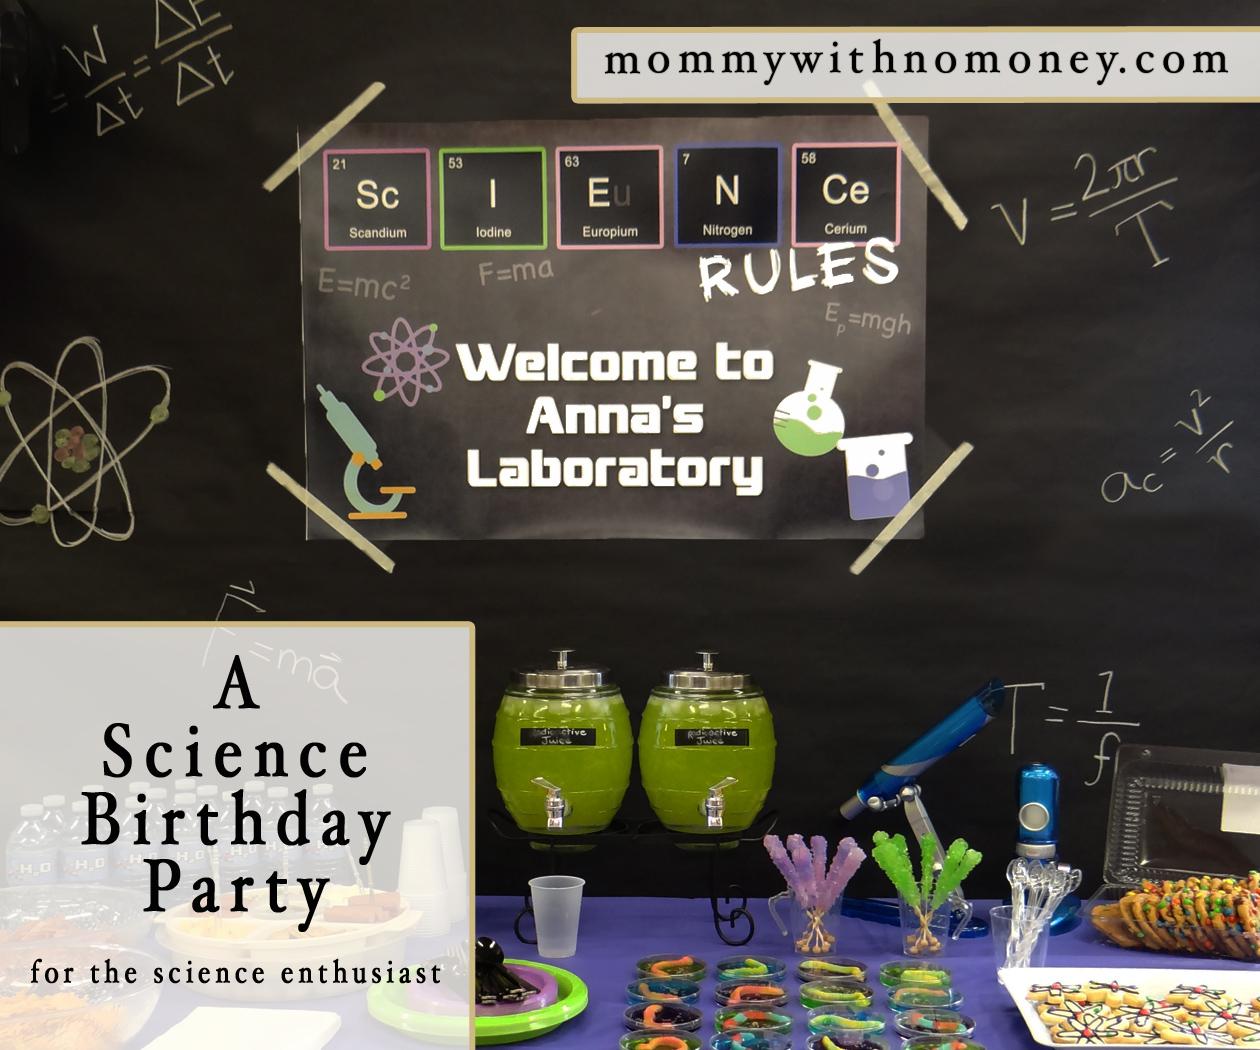 Science Birthday Pinterest Mommy with no Money.jpg